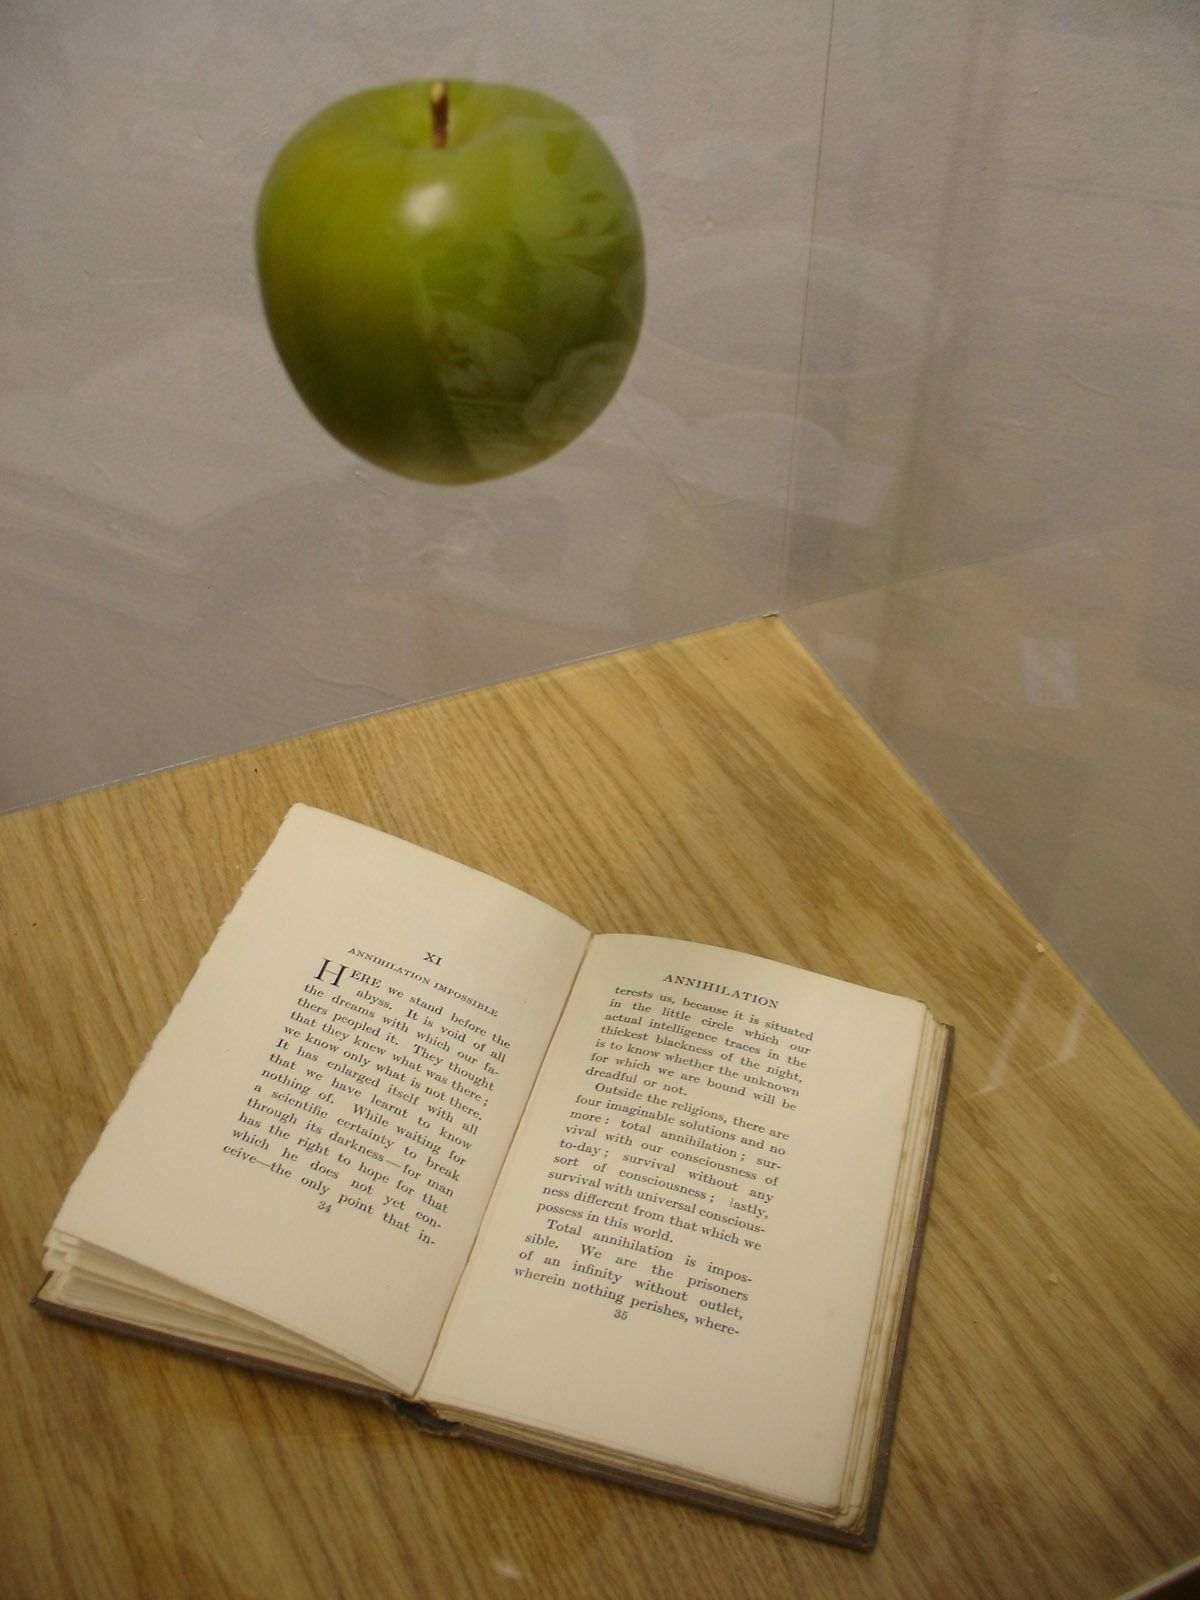 Paul Fryer  Annihilation Impossible  Annihilation Impossible, 2007 (Vitirne, composite apple, book, Kevlar thread, Oak veneered plinth)  1450mm x 405mm x 405mm